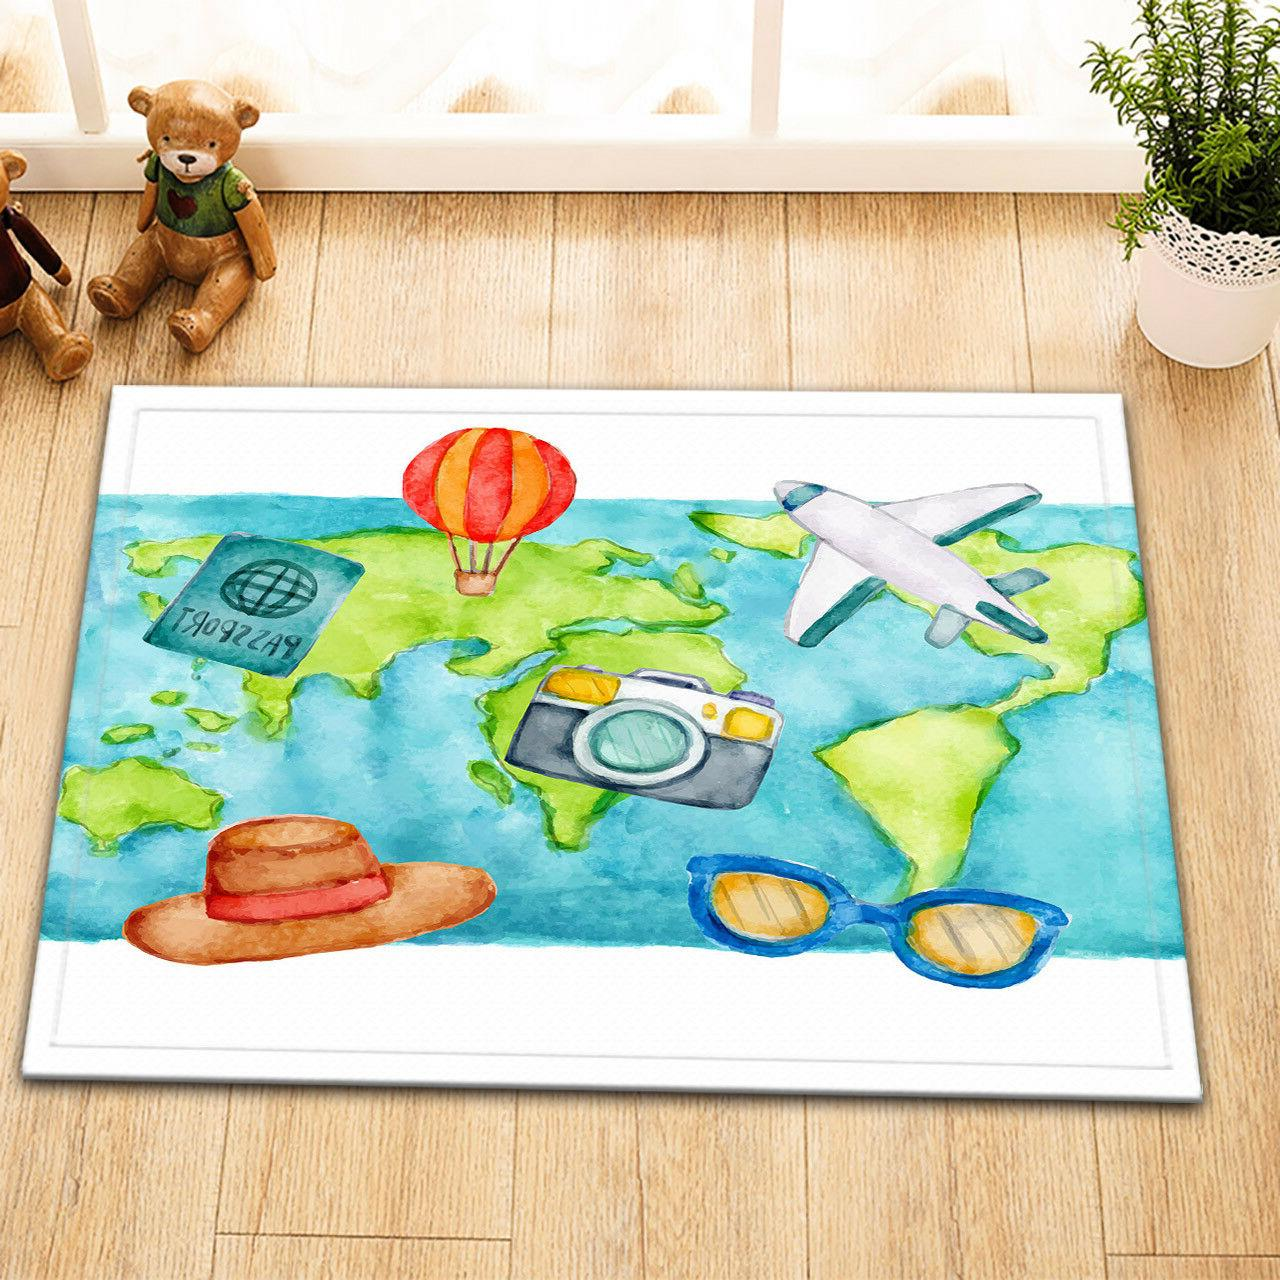 Fabric Shower World Travel Bath Accessory Sets Mat